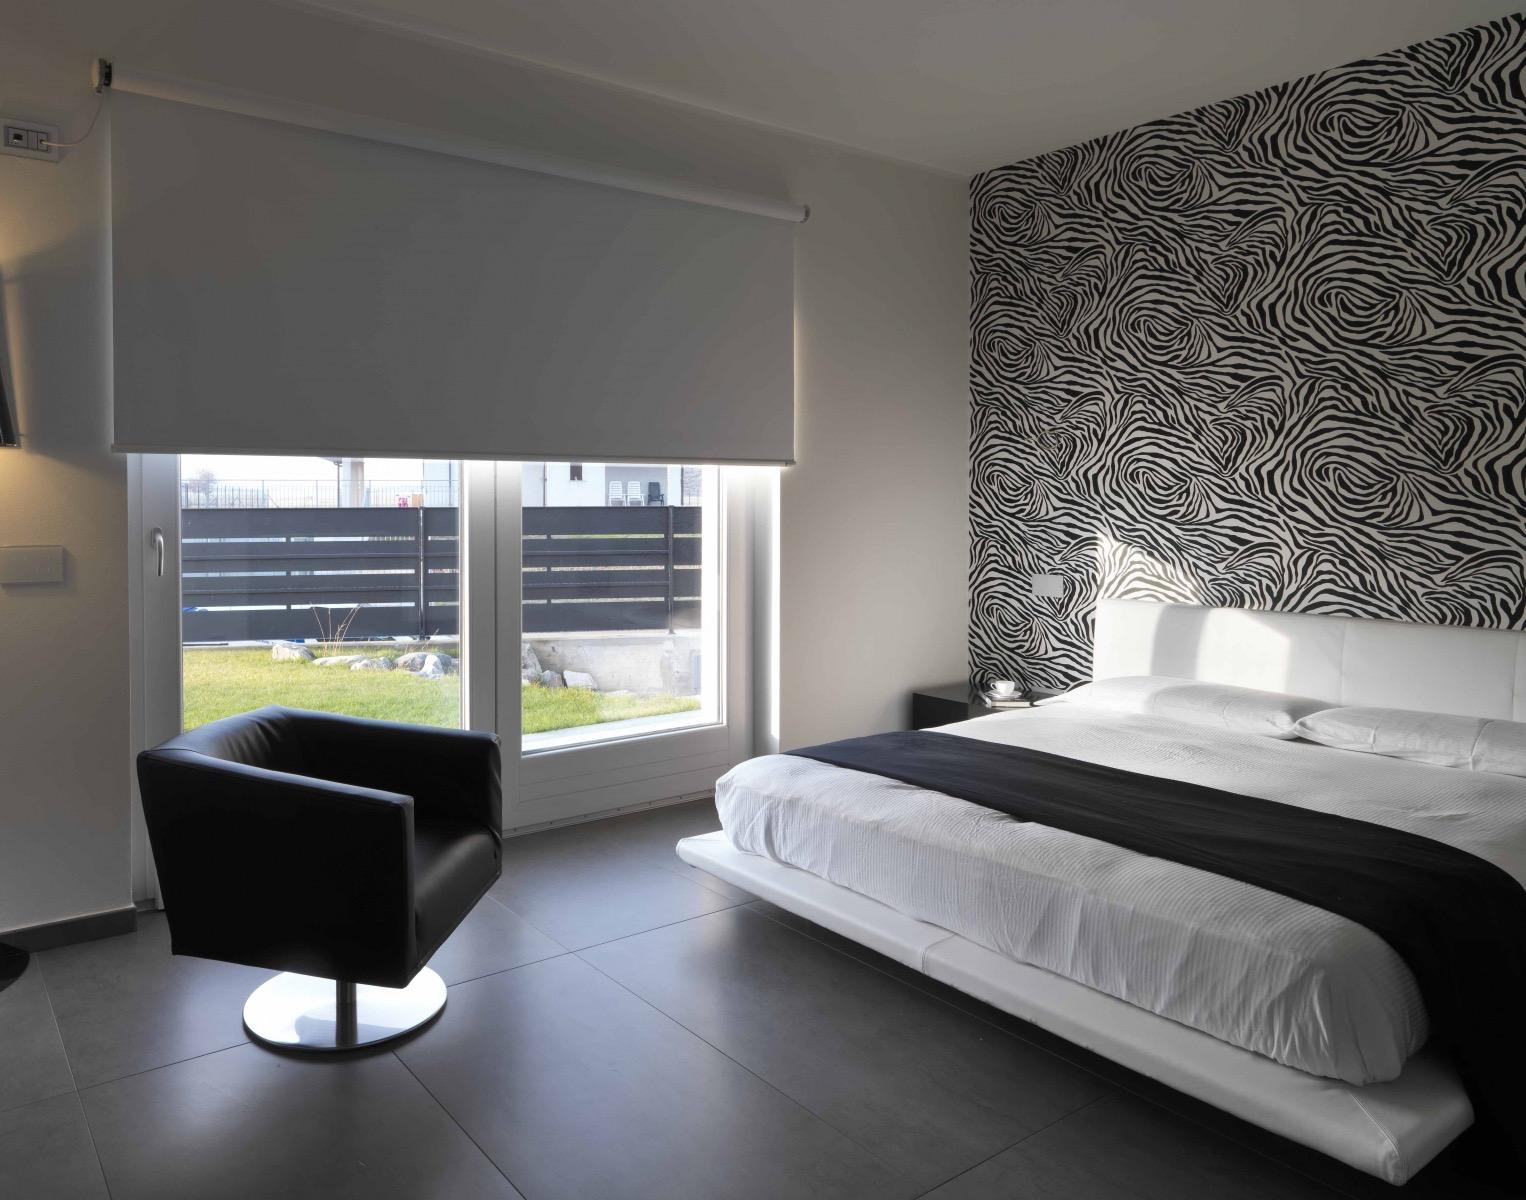 Raamdecoratie Slaapkamer Verduisterend @AC49 – Aboriginaltourismontario